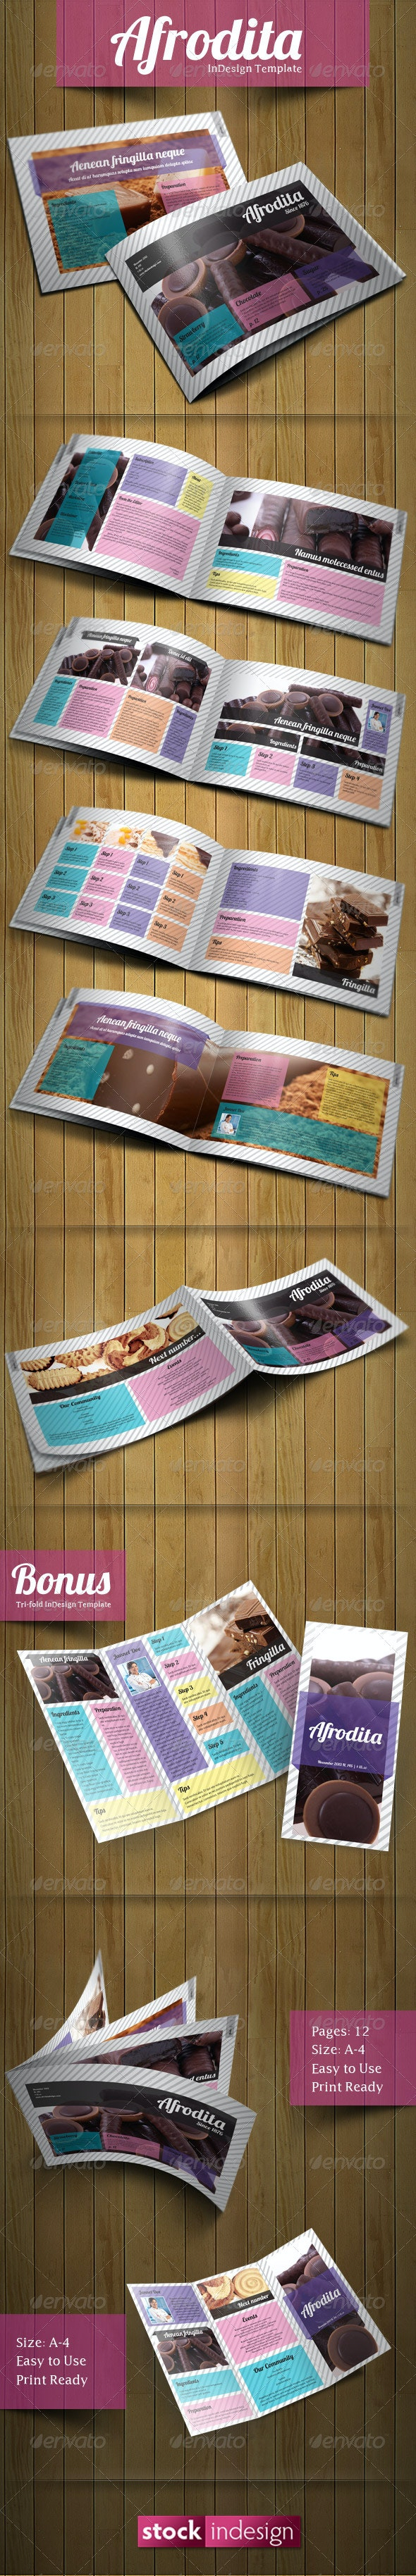 Afrodita Brochure: Modern & Clean - Corporate Brochures